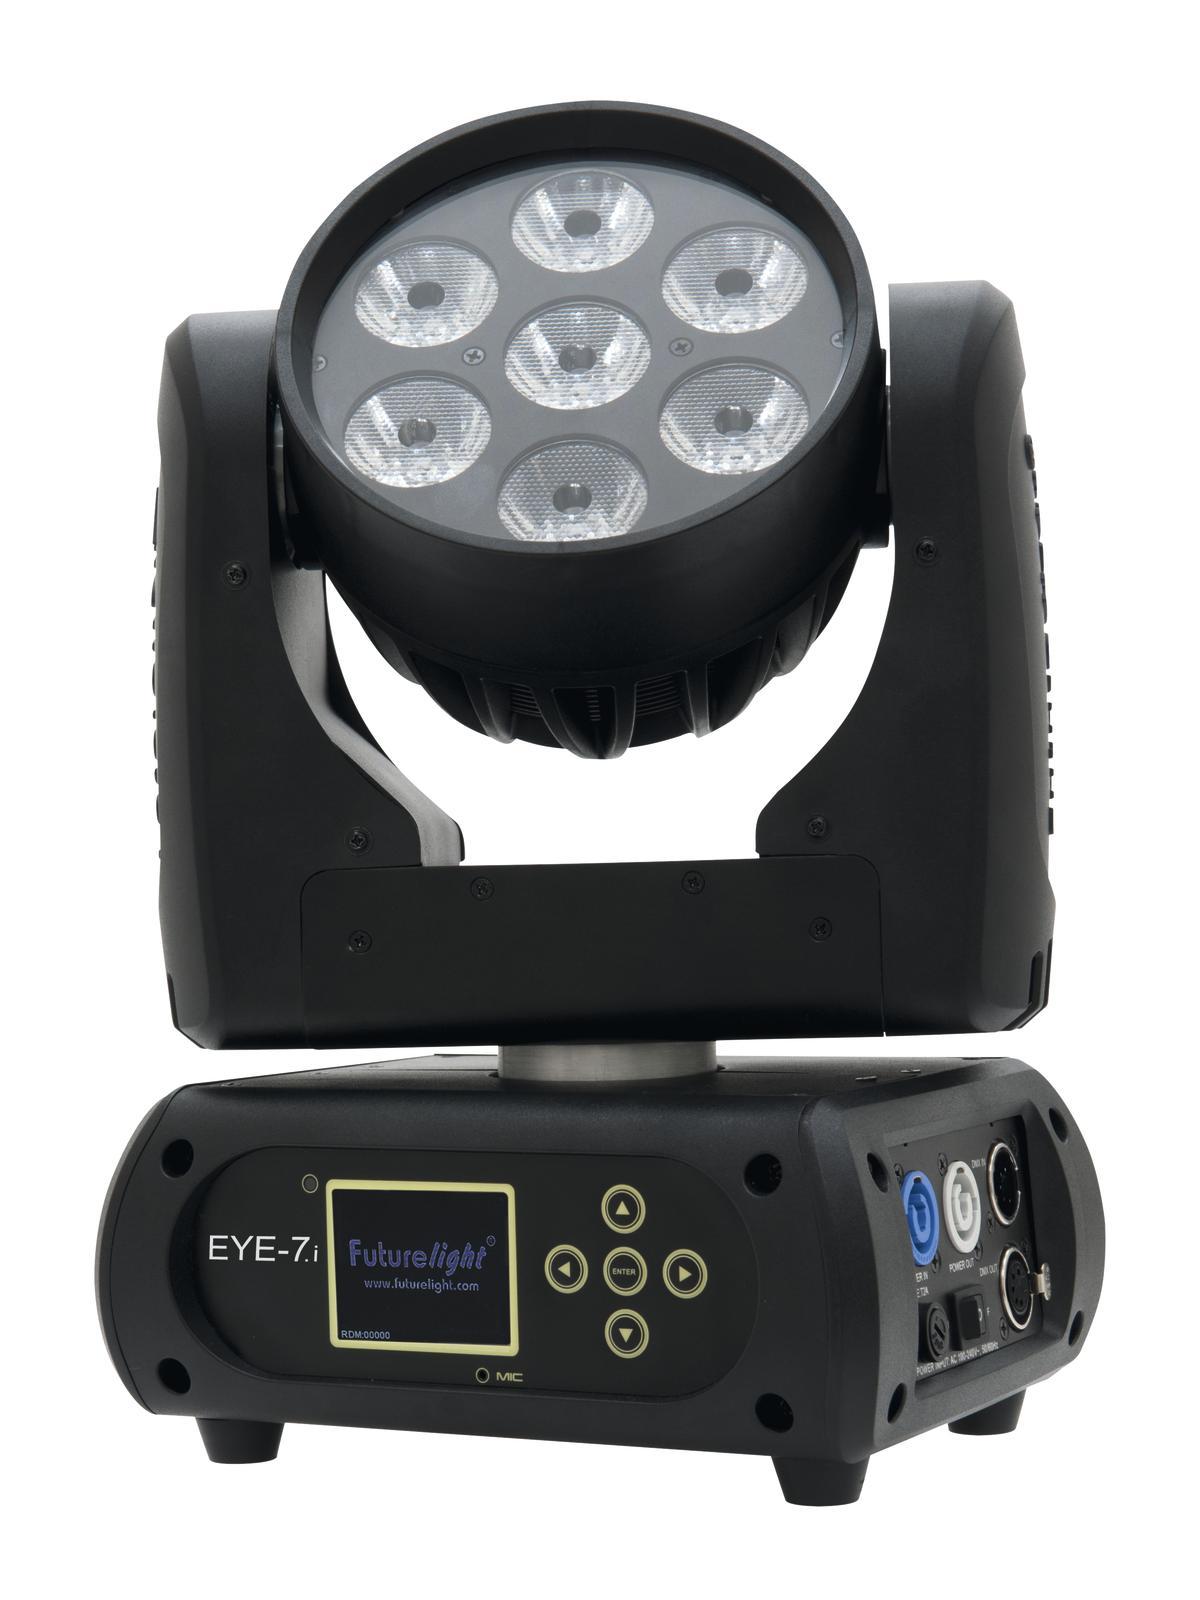 Testa mobile Moving Head Beam FUTURELIGHT EYE-7.i LED Moving Head Beam DMX 110W